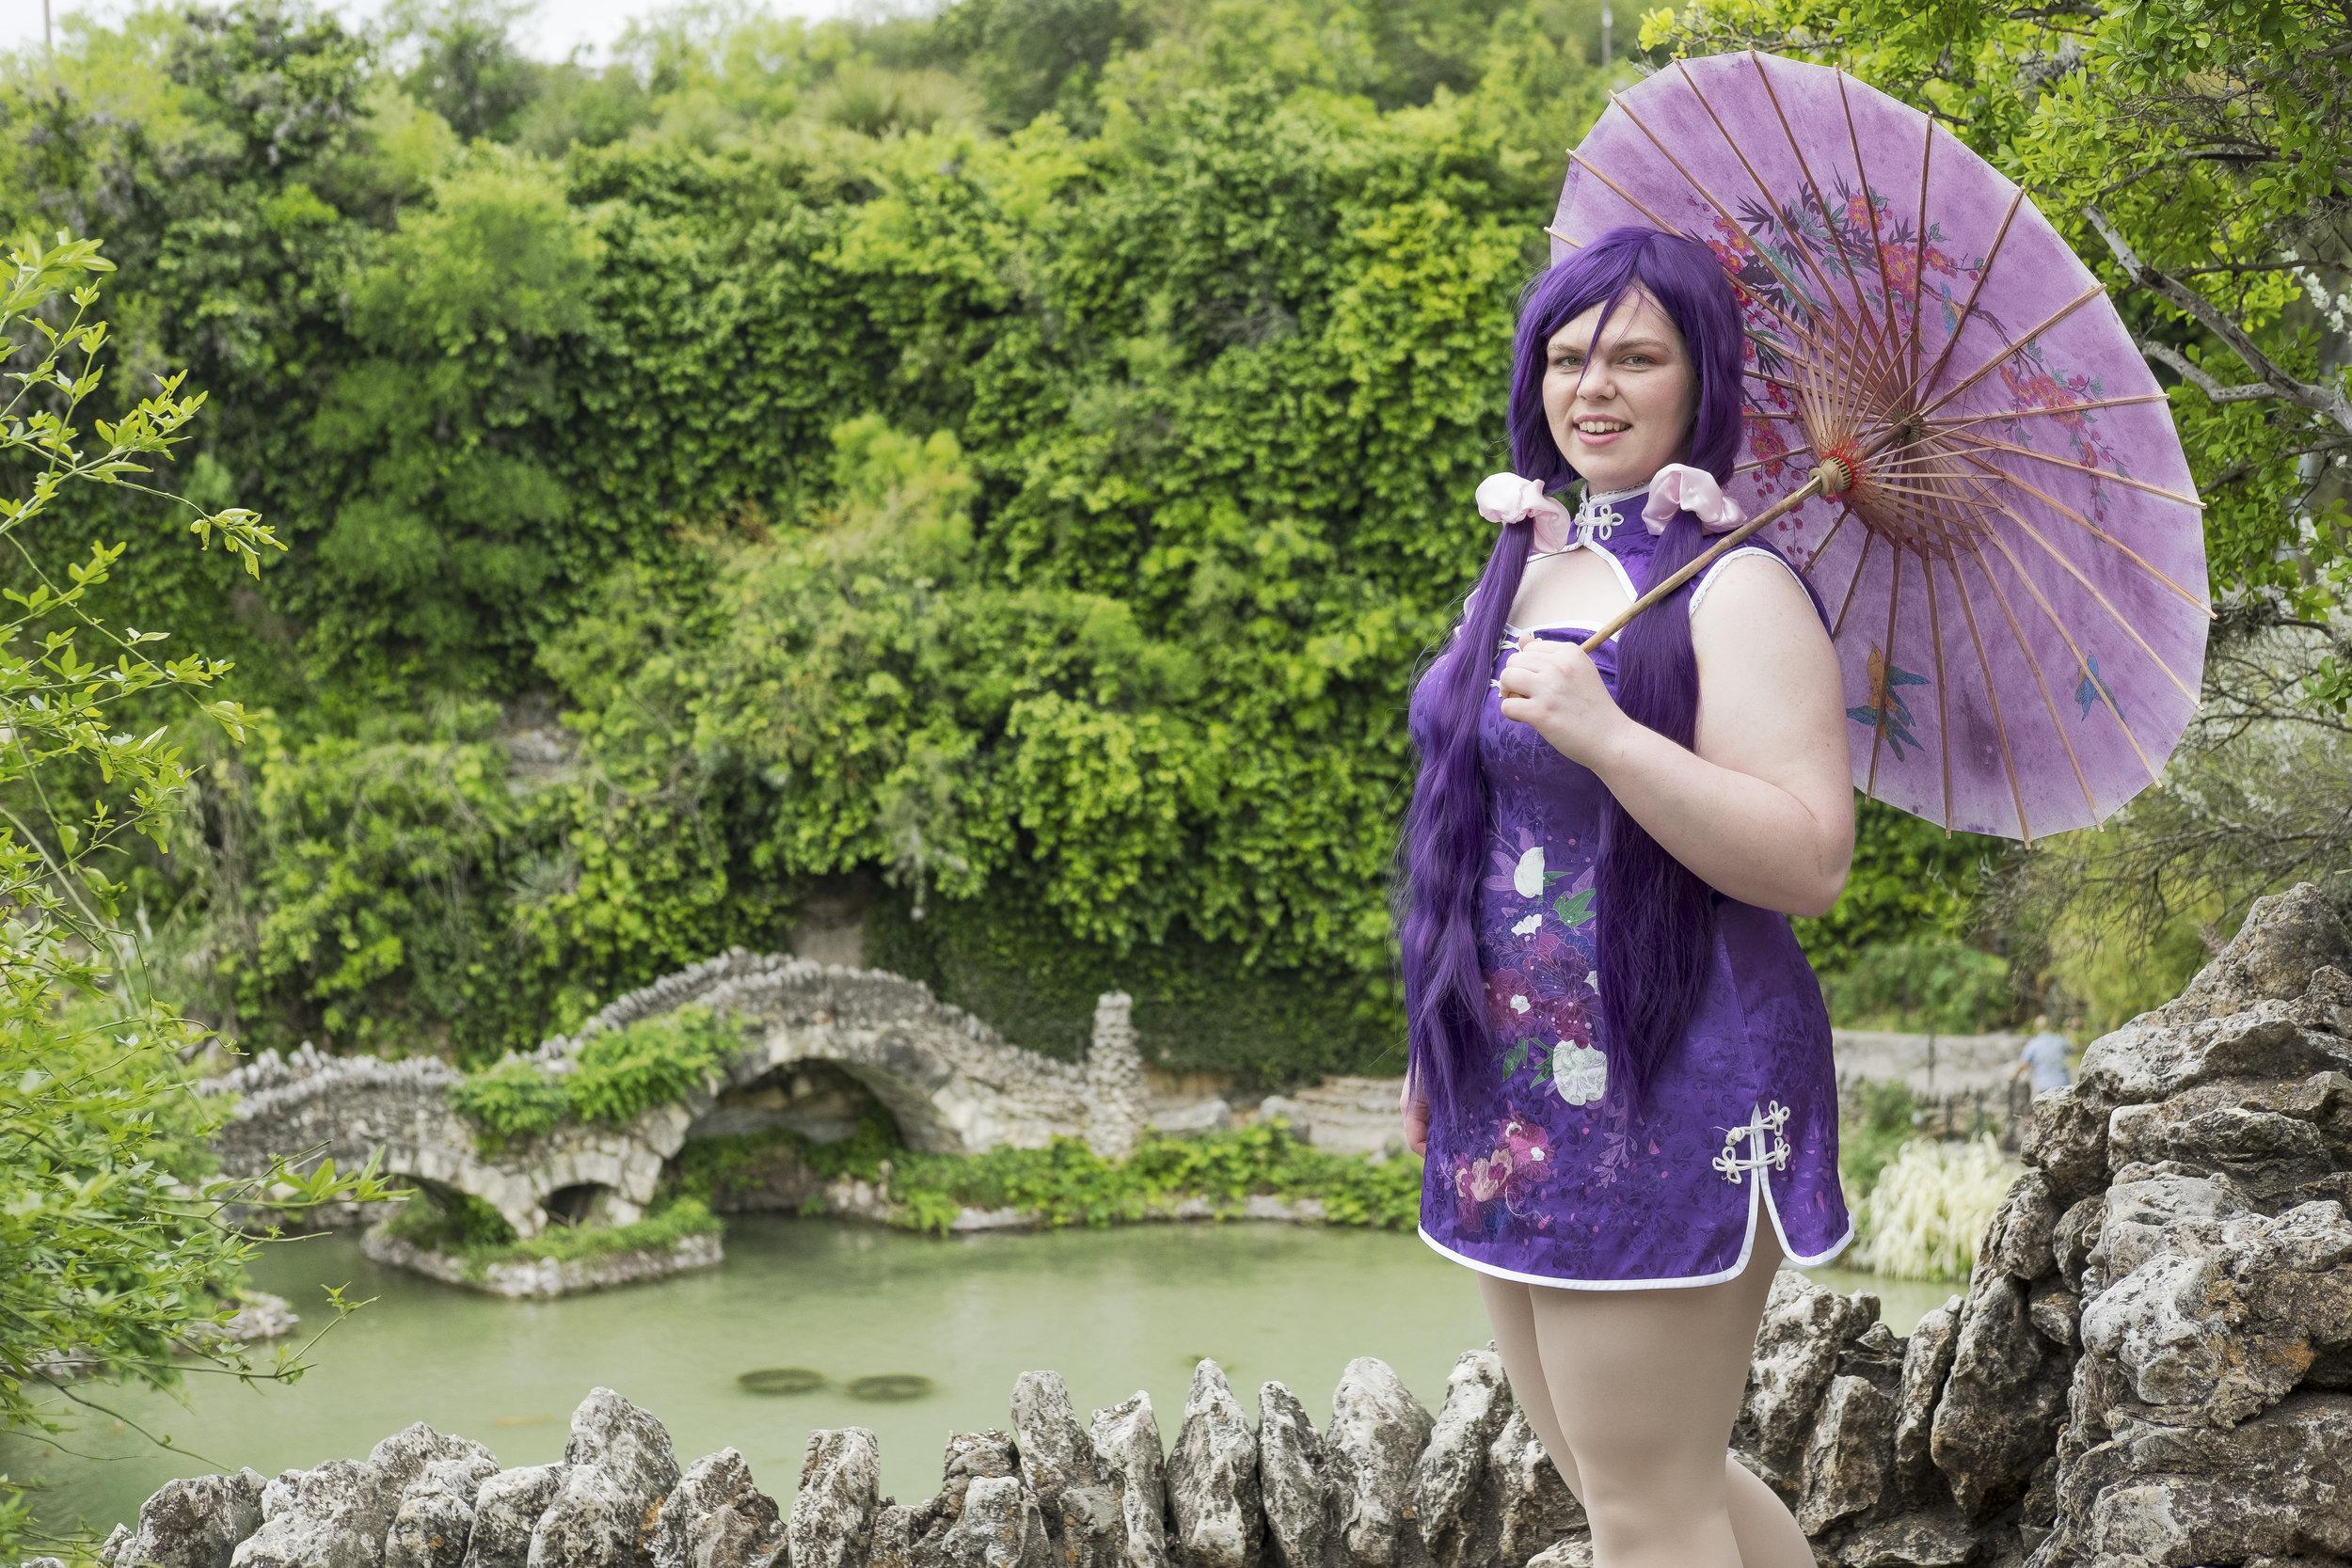 Tacocat Cosplay in Nozomi Tojo cosplay at the San Antonio Japanese Tea Gardens